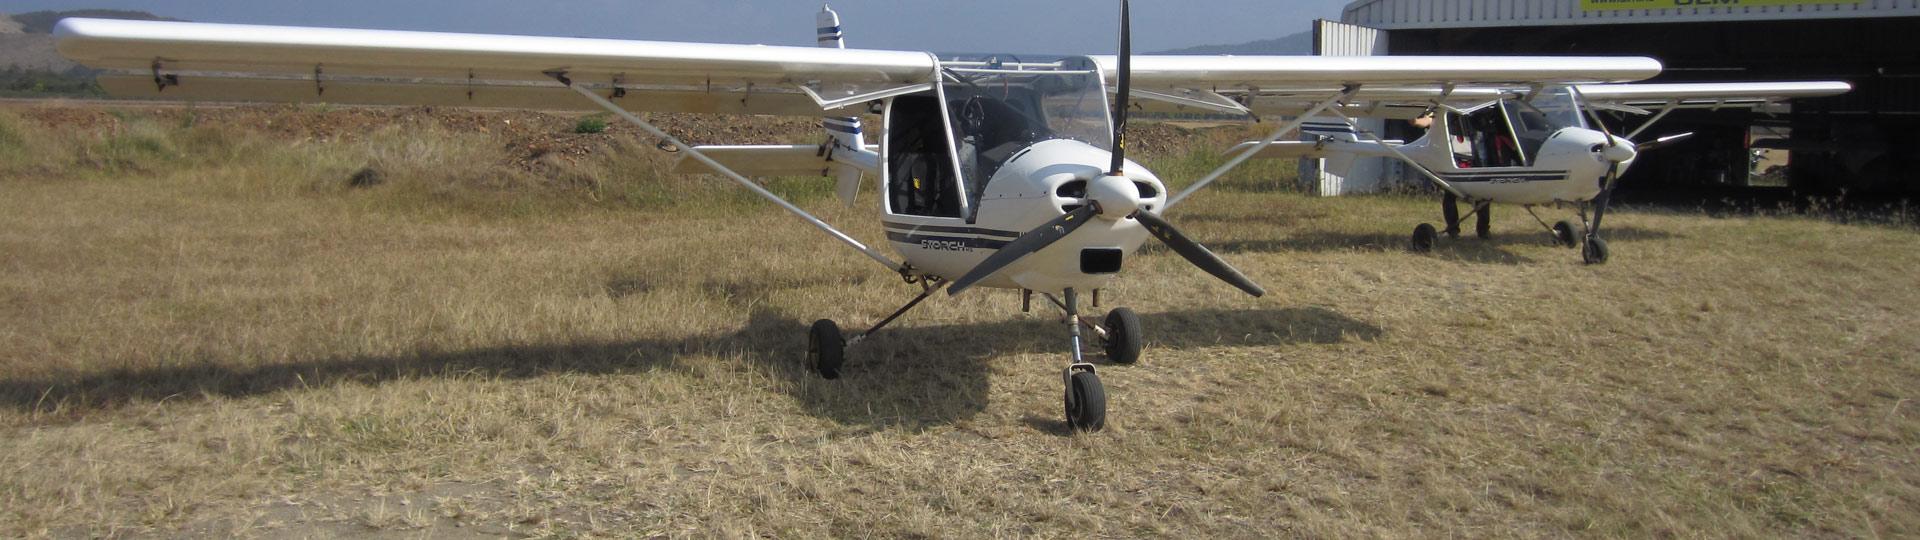 New Caledonia - Ultralight flights